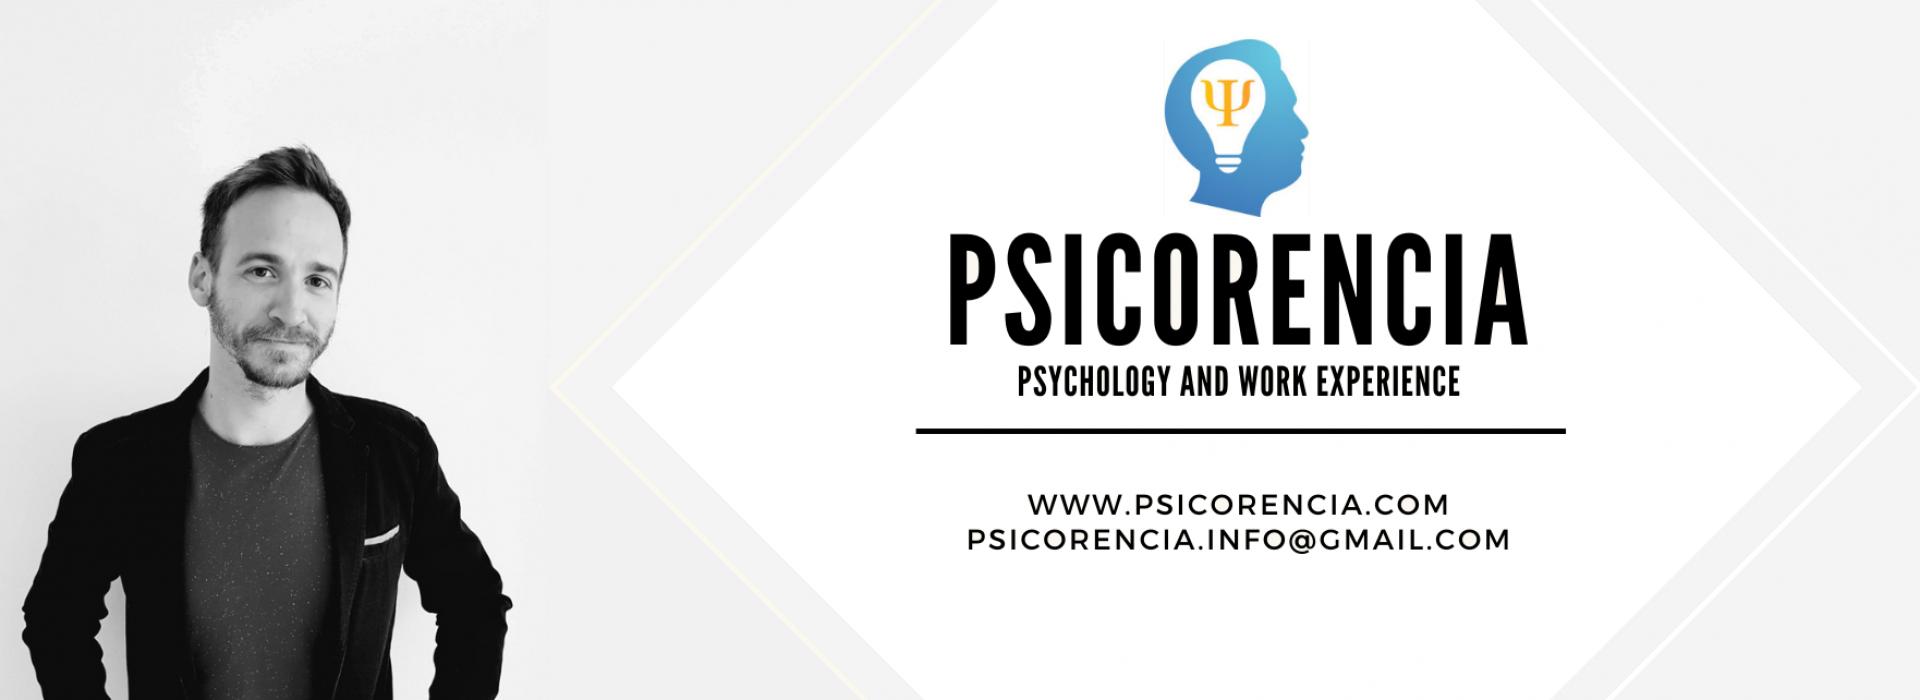 PSICORENCIA